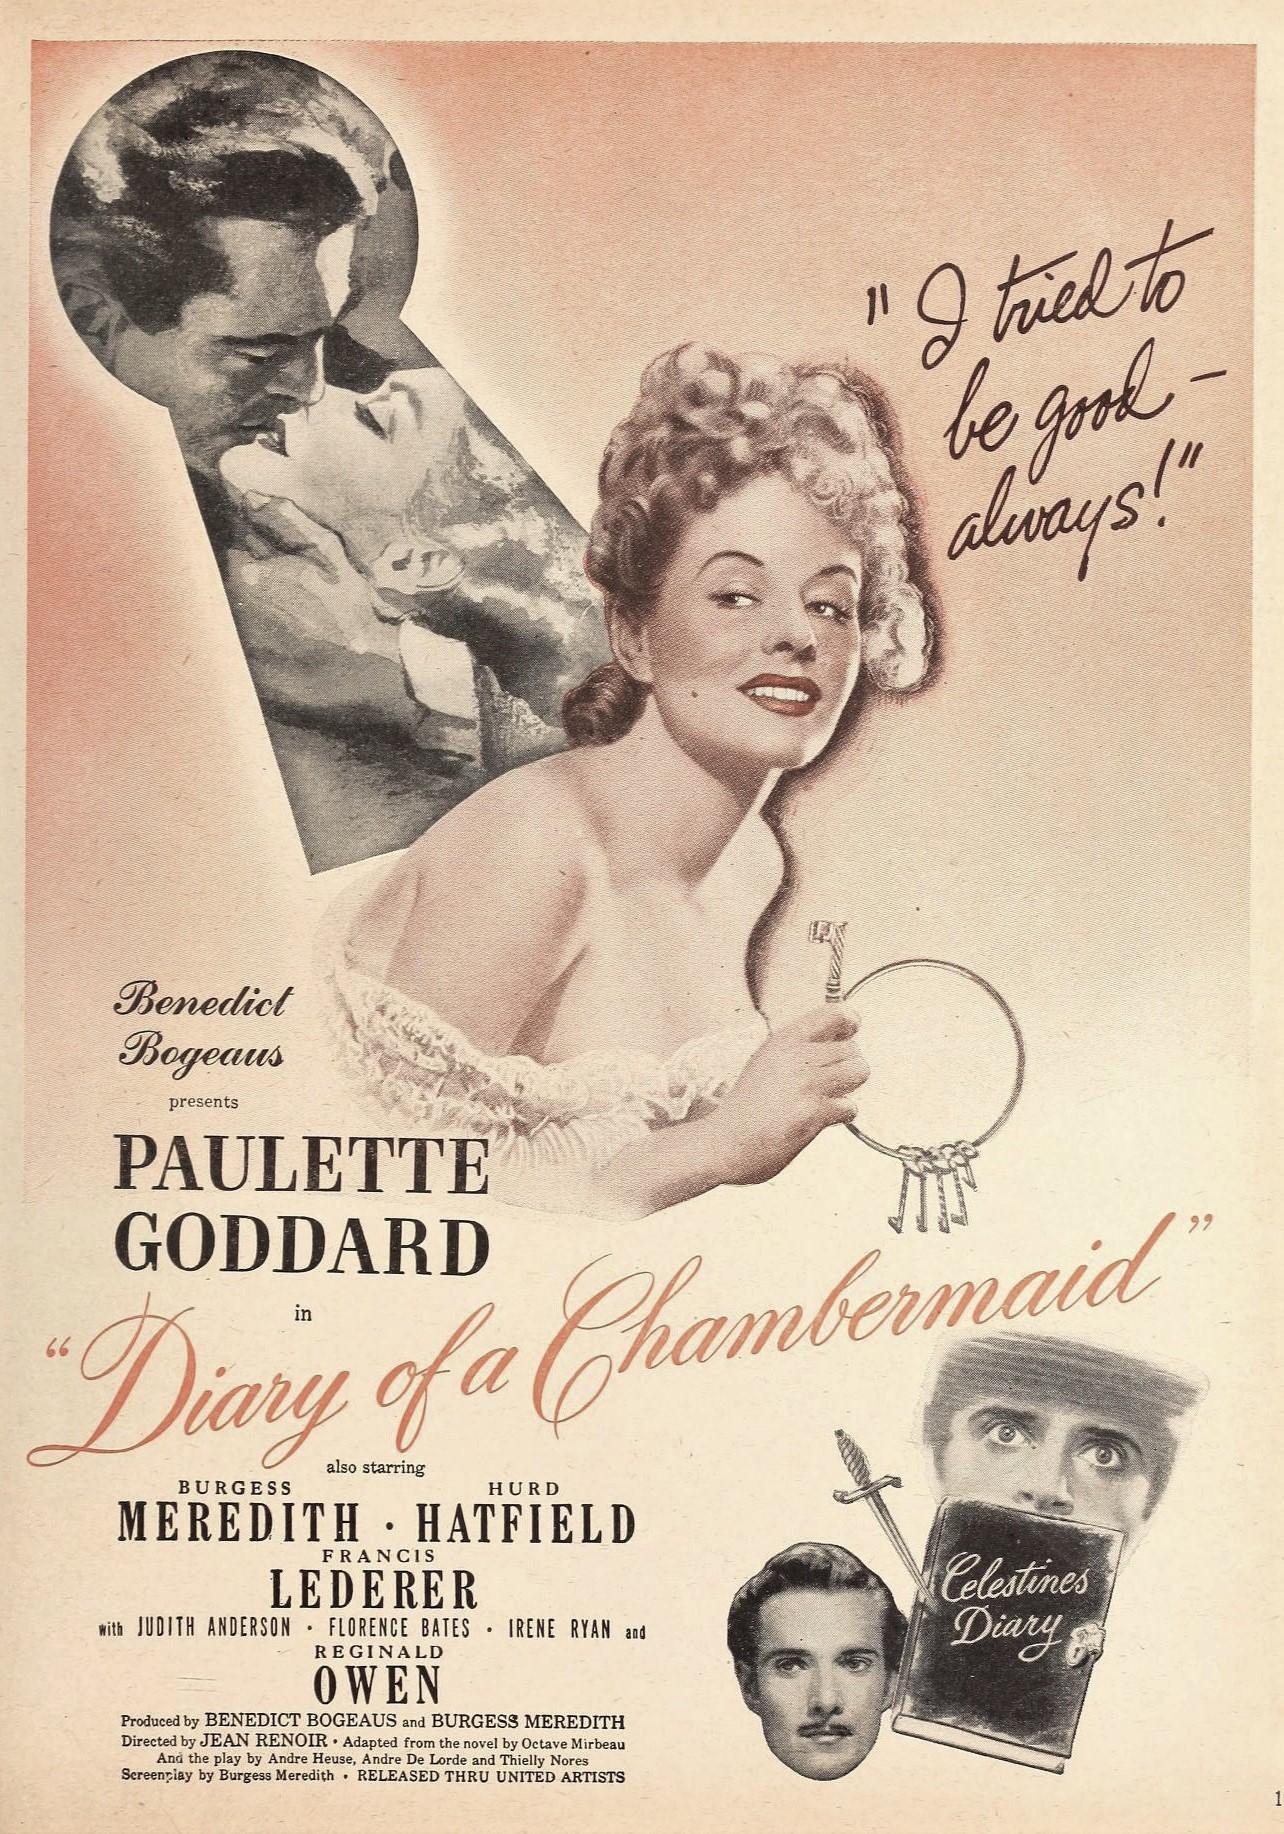 File:Paulette Goddard in 'The Diary of a Chambermaid', 1946.jpg ...